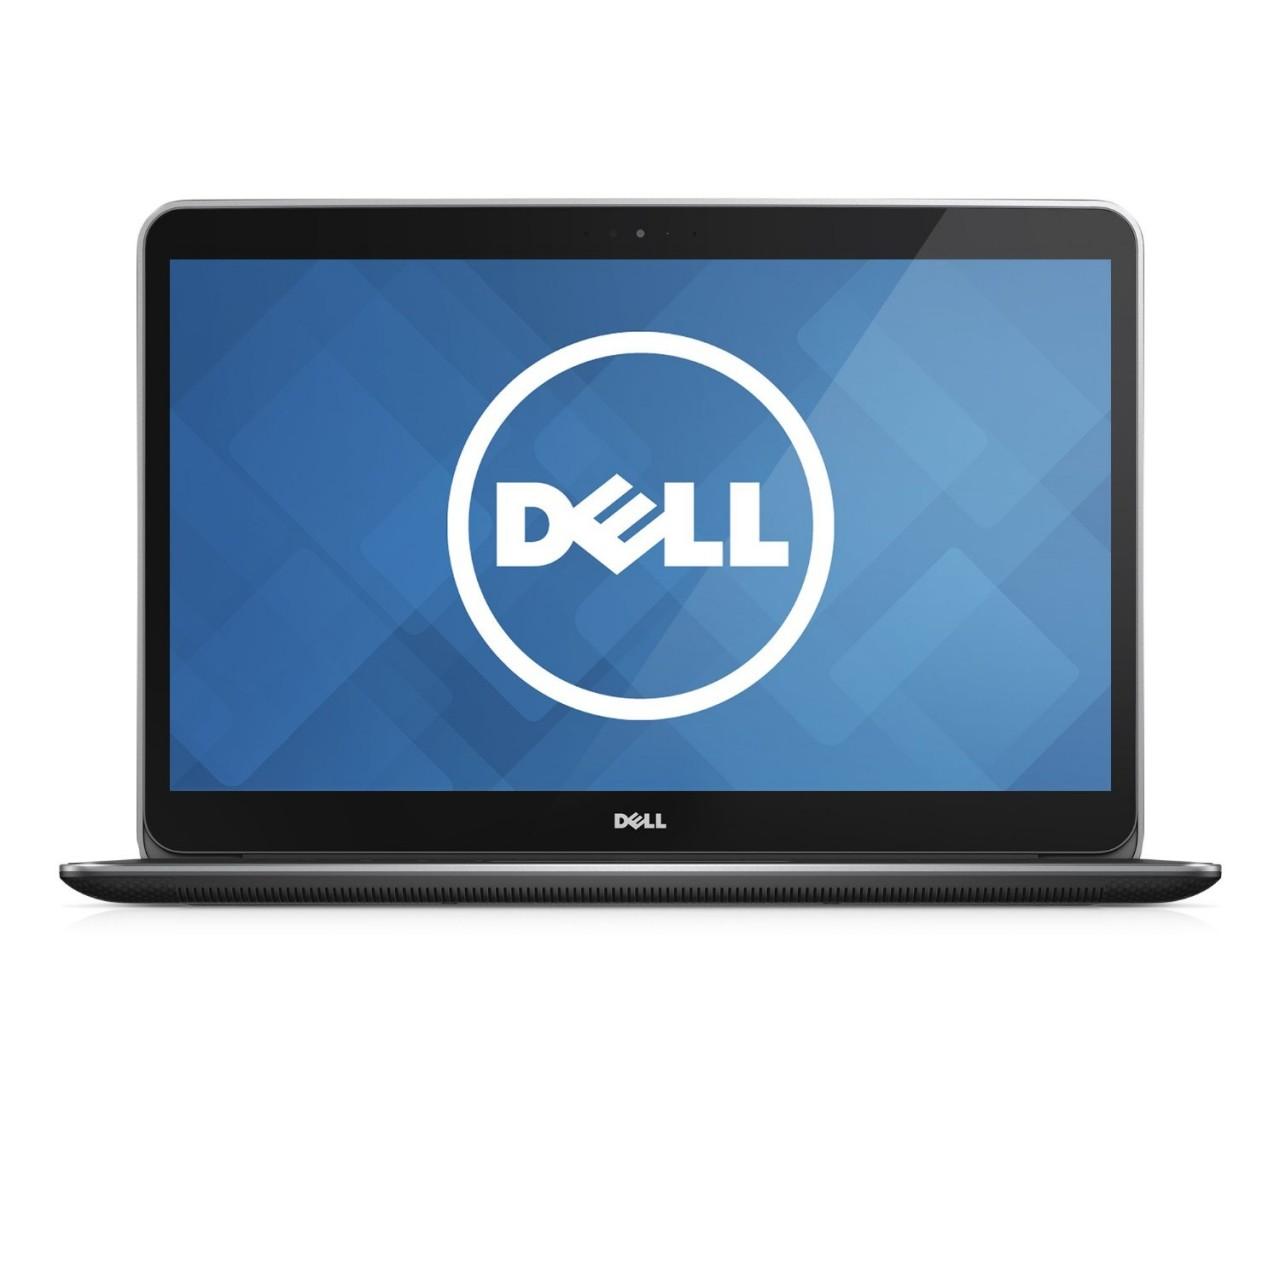 Dell XPS 15 9530 - Core i7 Quad Core 15 6